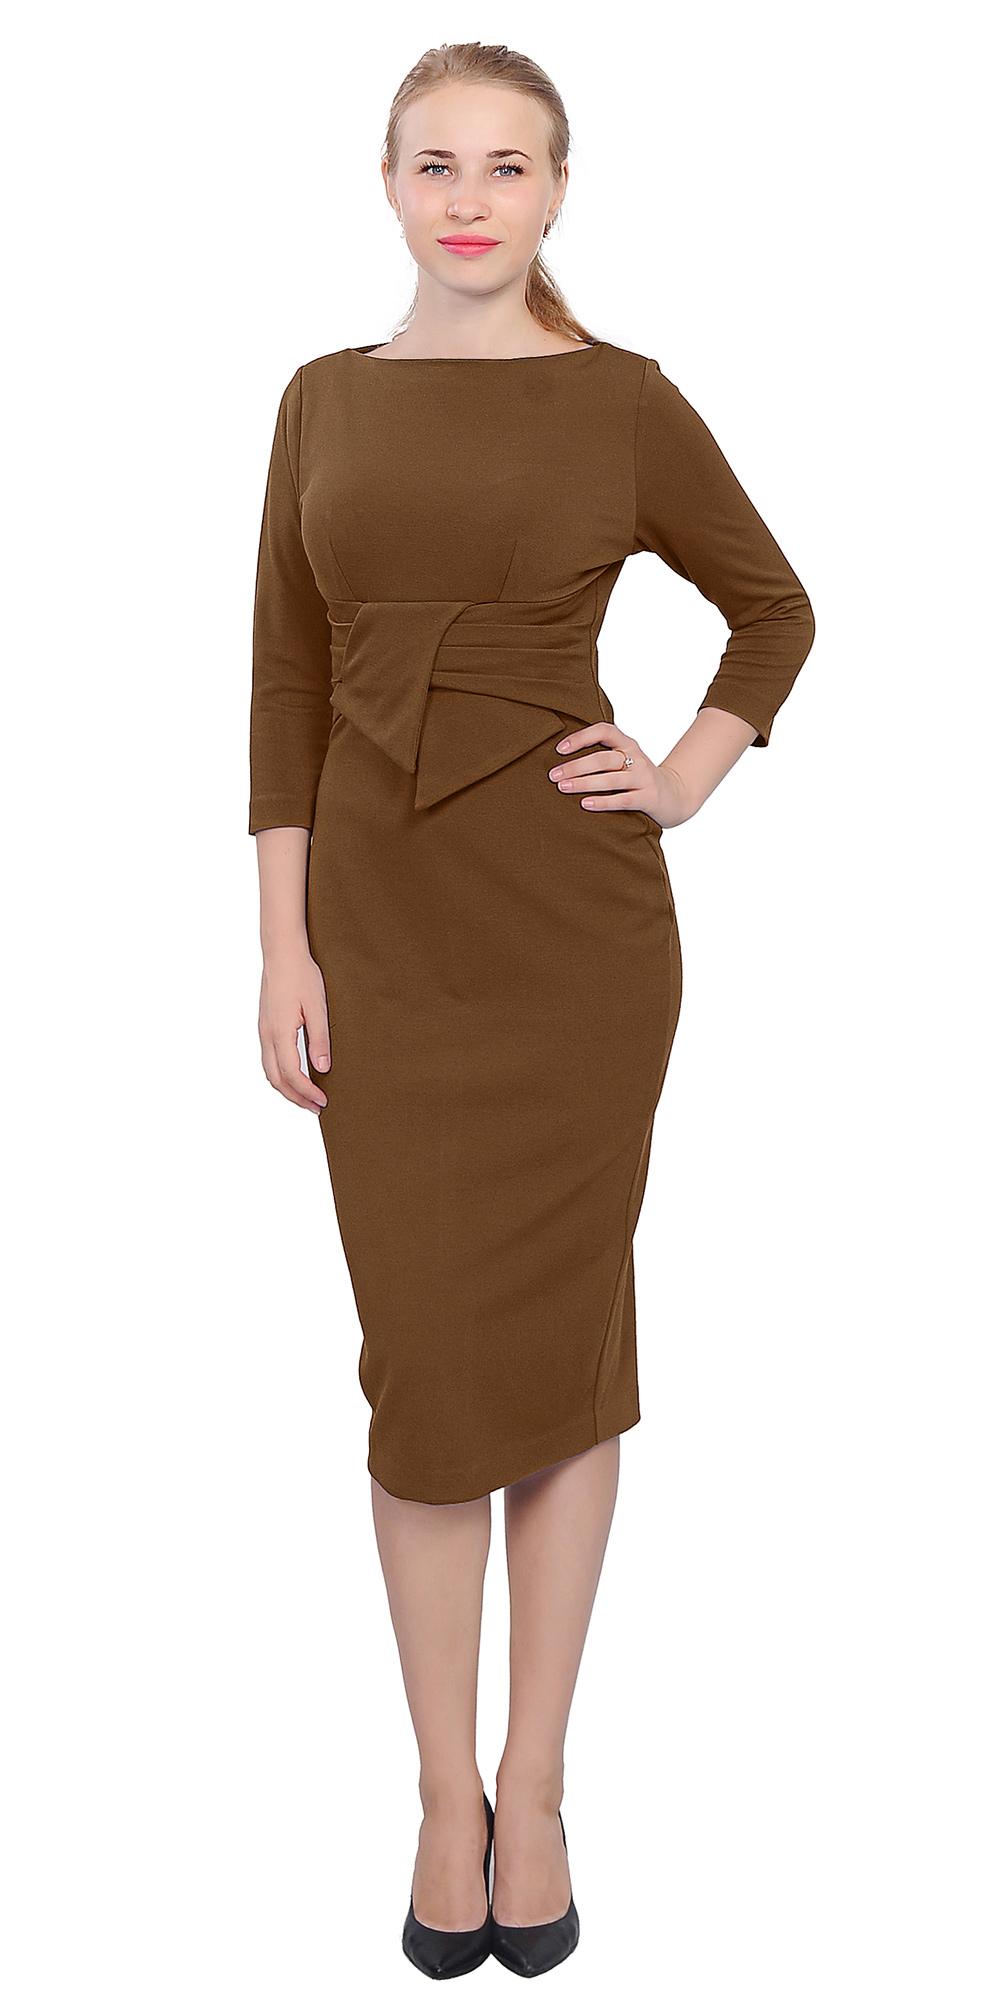 Wiggle Midi Dress Lady Vintage Retro 1950s Evening Work